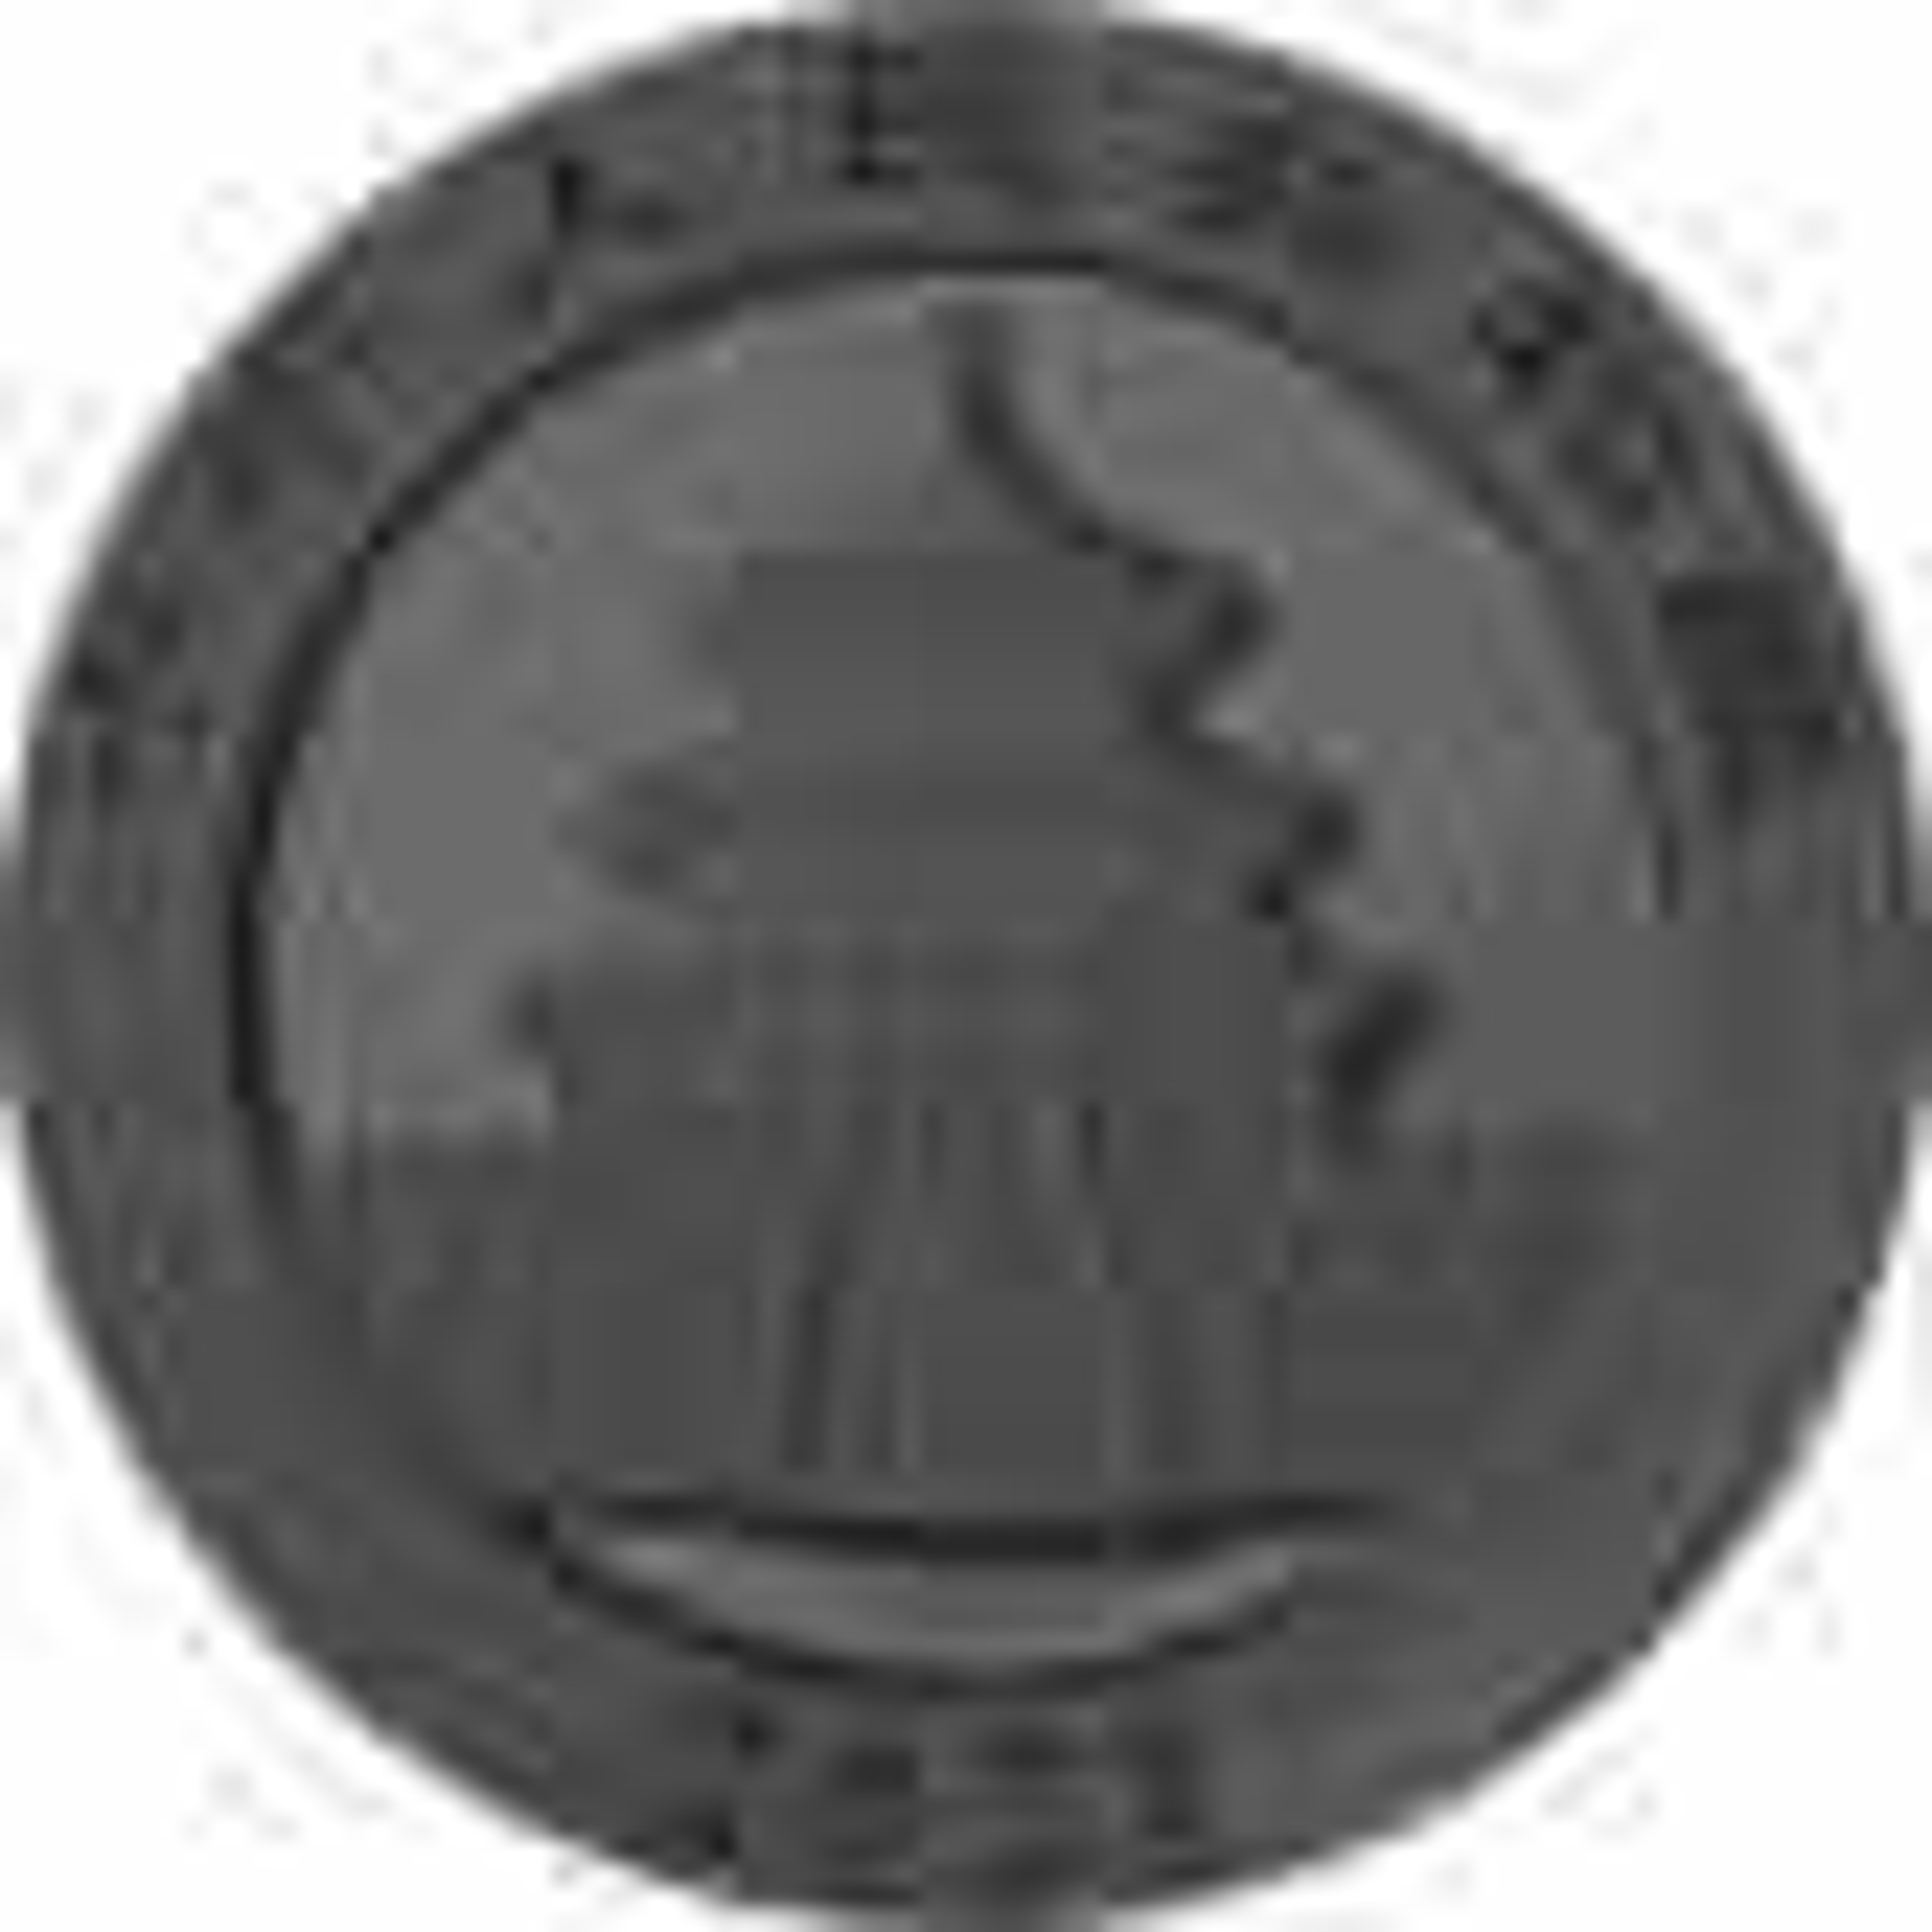 30 gram zilveren munt gouden holo serie Panda 2021 - achterkant